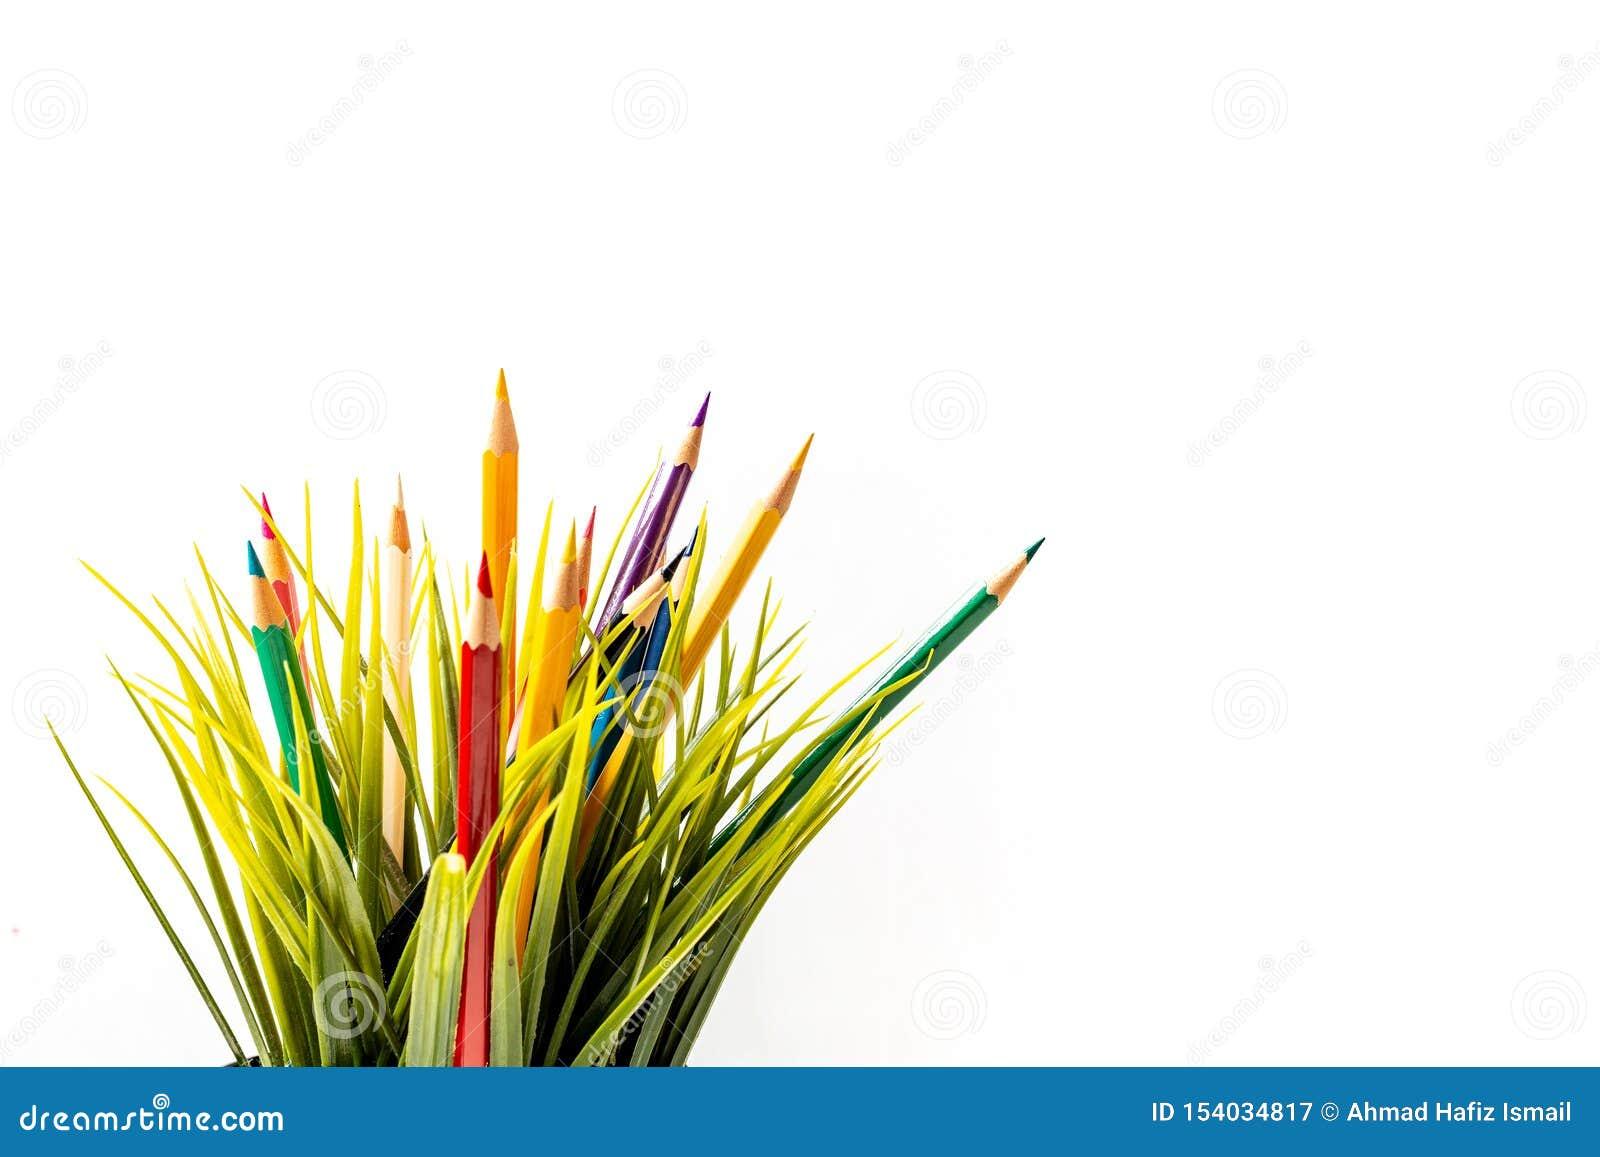 Nature Growth - Still Life Conceptual